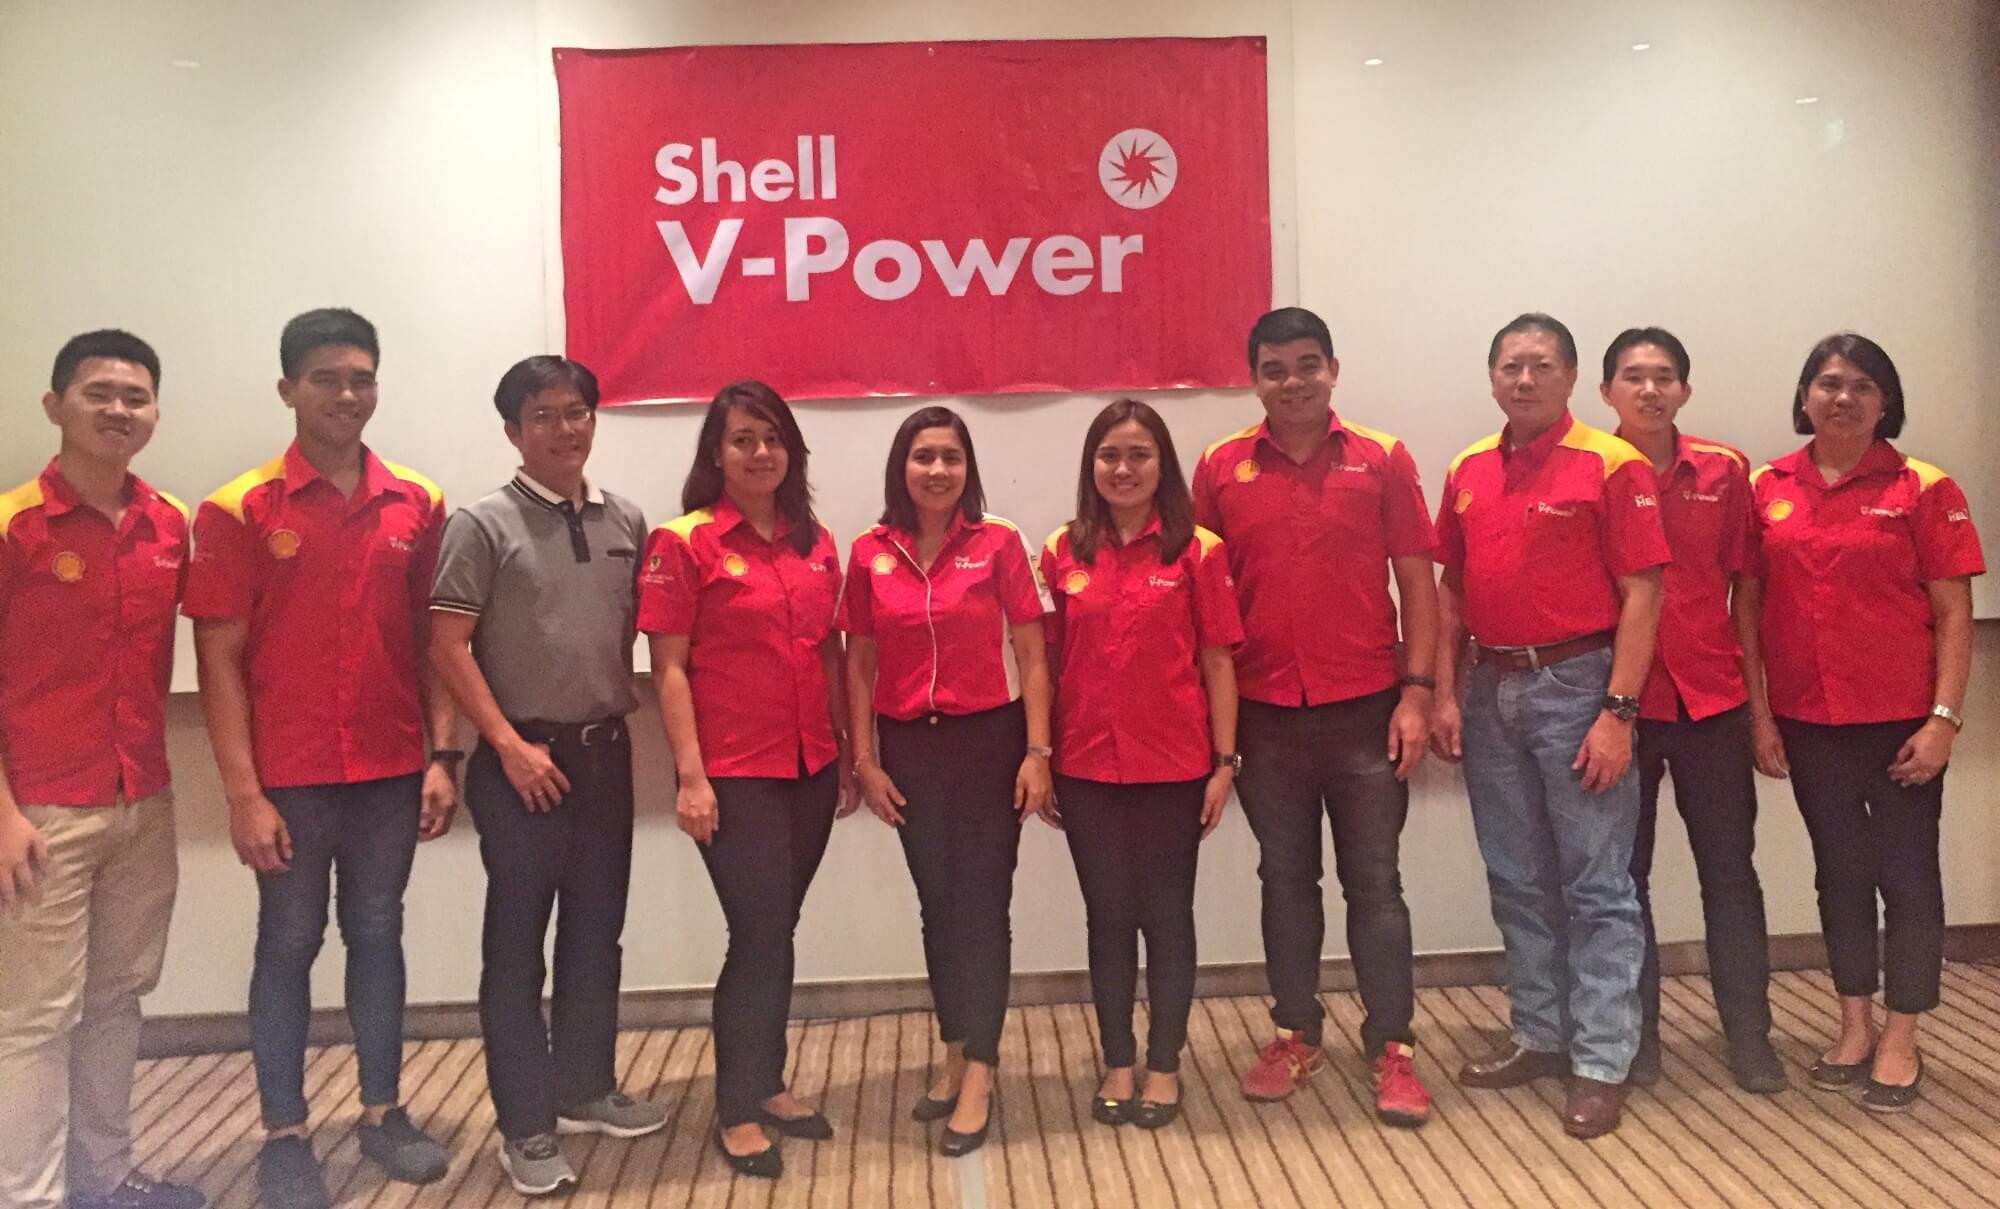 Shell V-Power Cebu launch